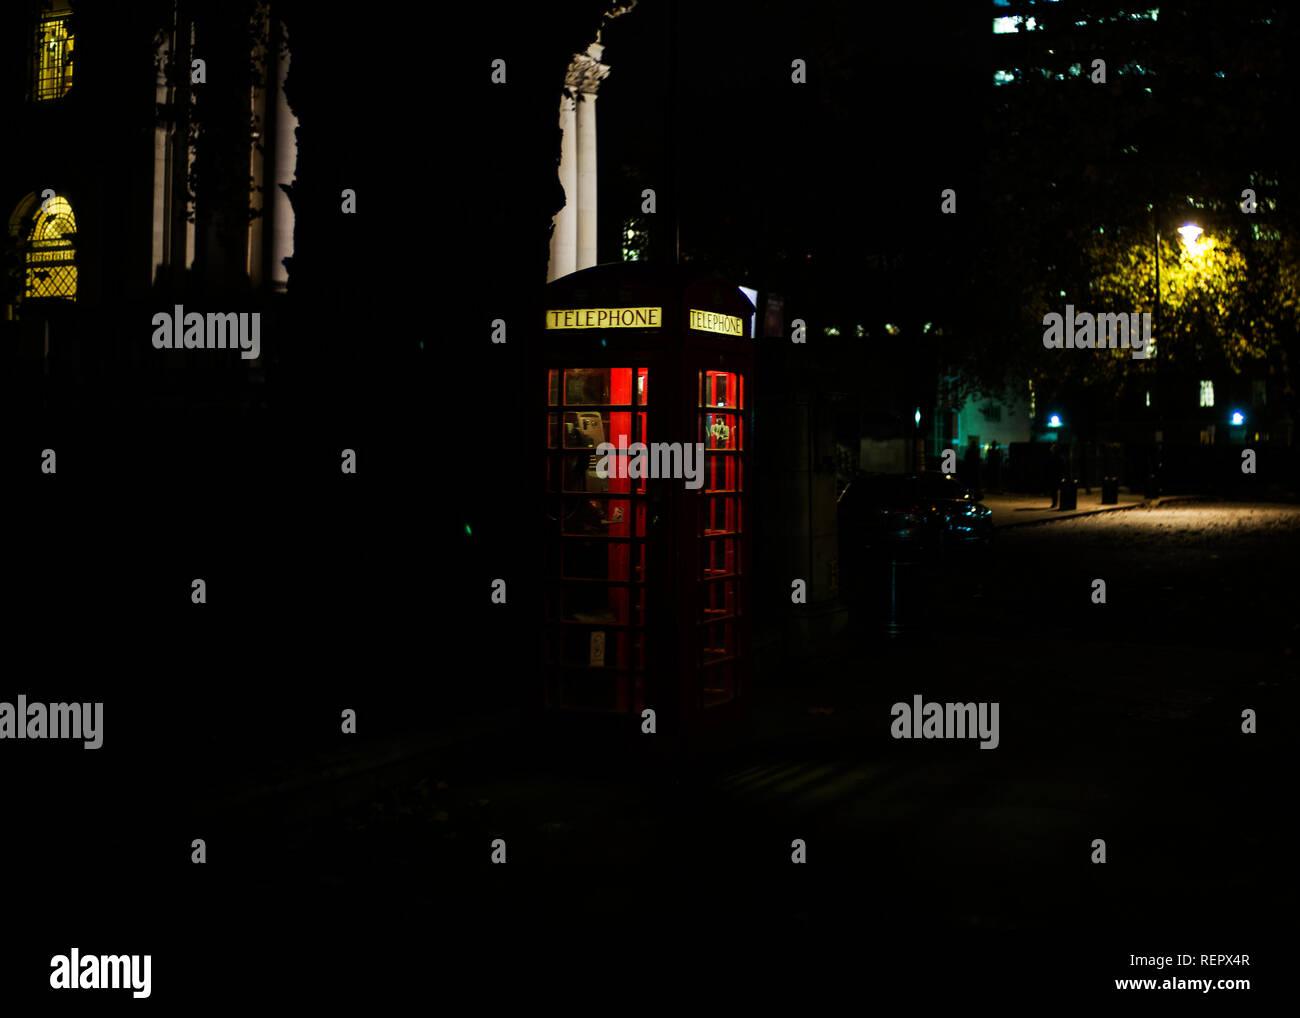 london telephone kiosk at night - Stock Image